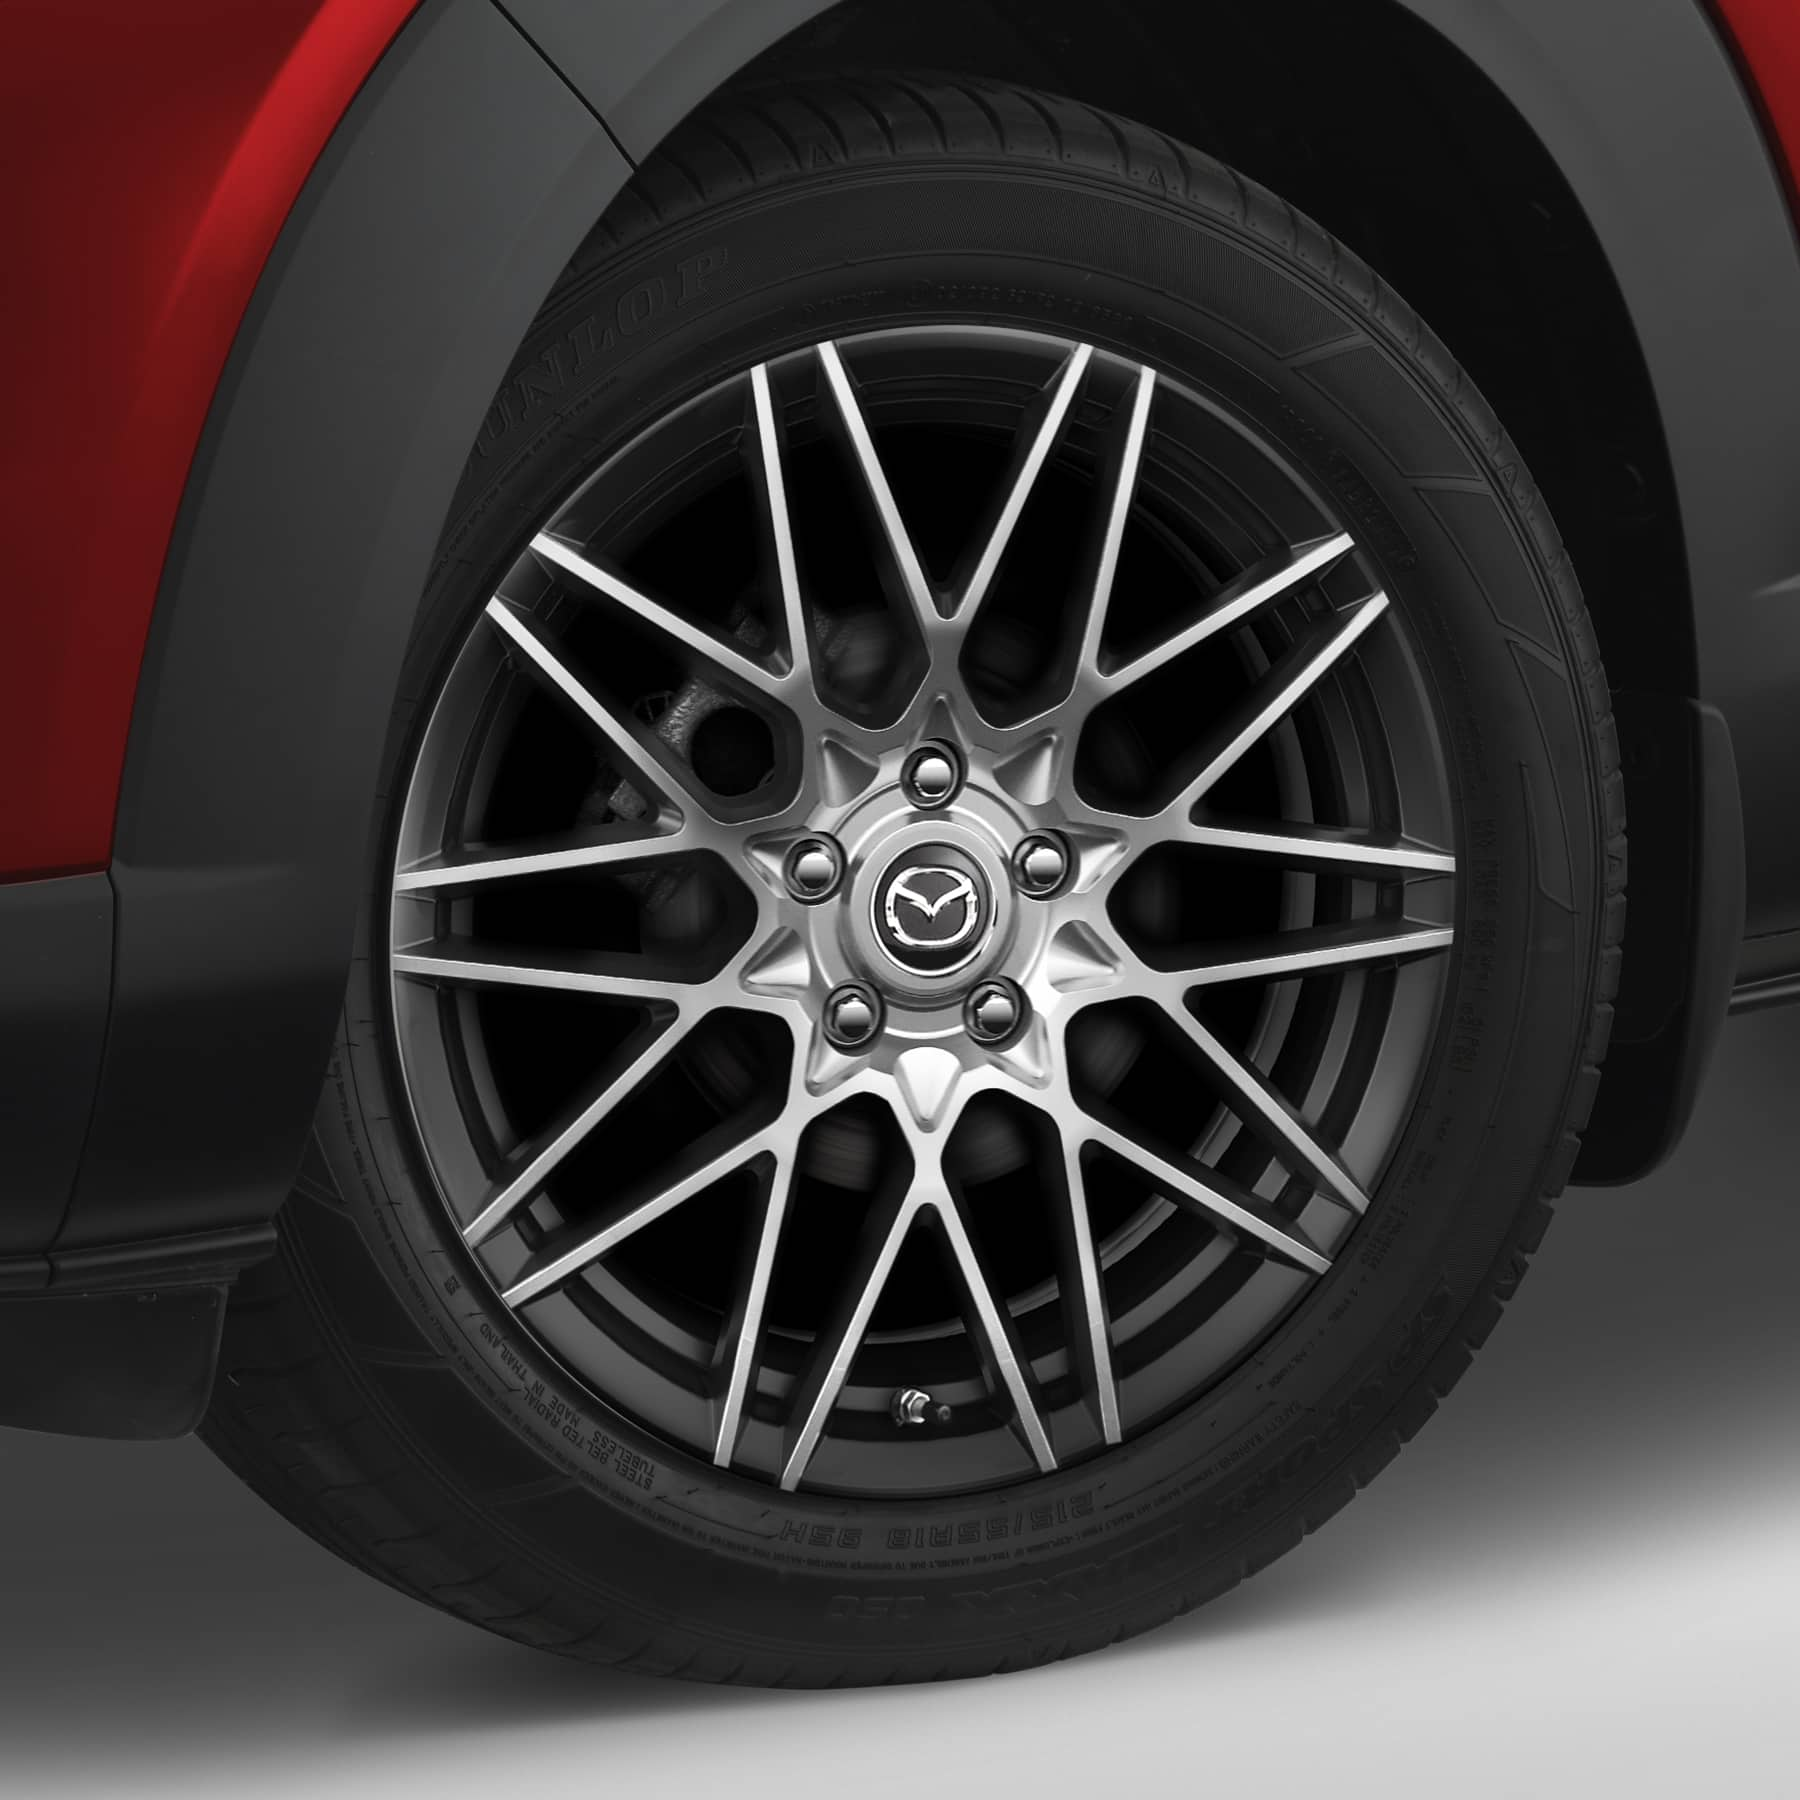 18-Inch Silver Alloy Wheel